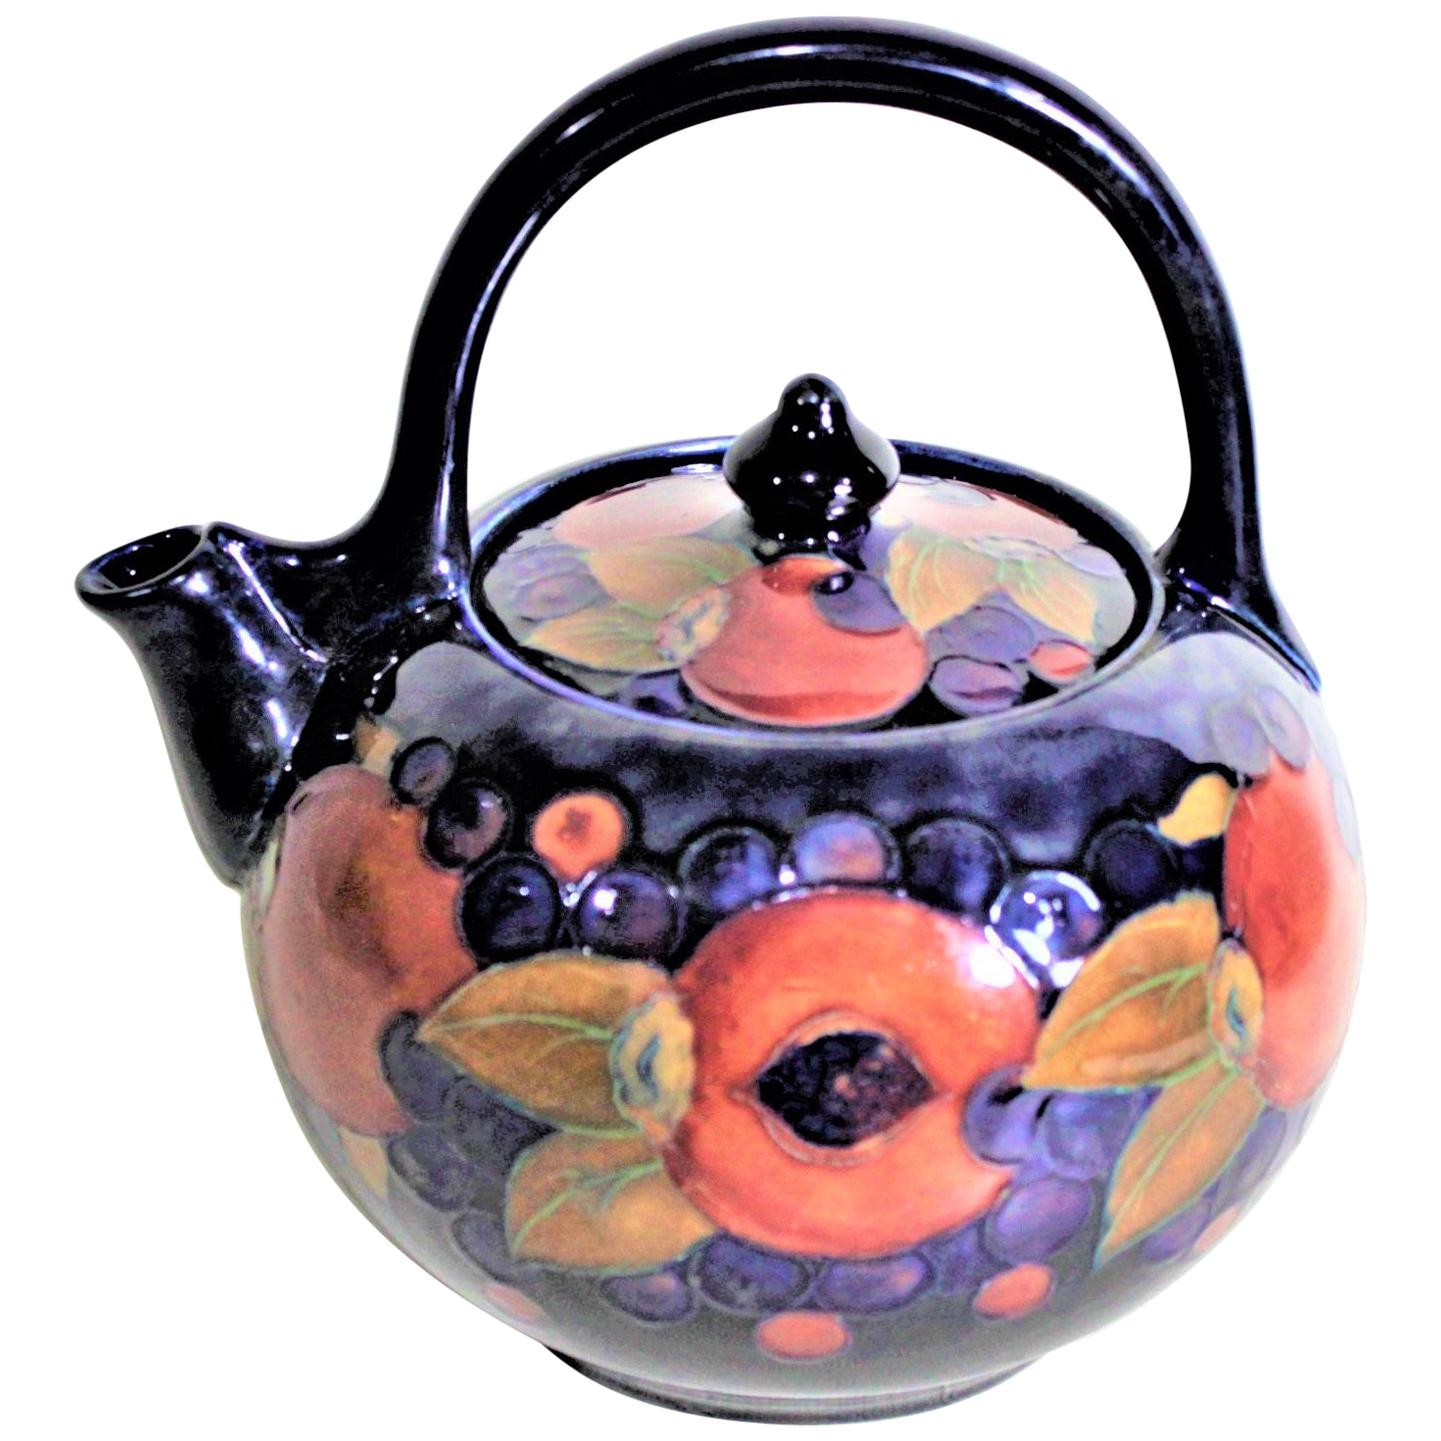 Large William Moorcroft Pomegranate Patterned Art Pottery Teapot